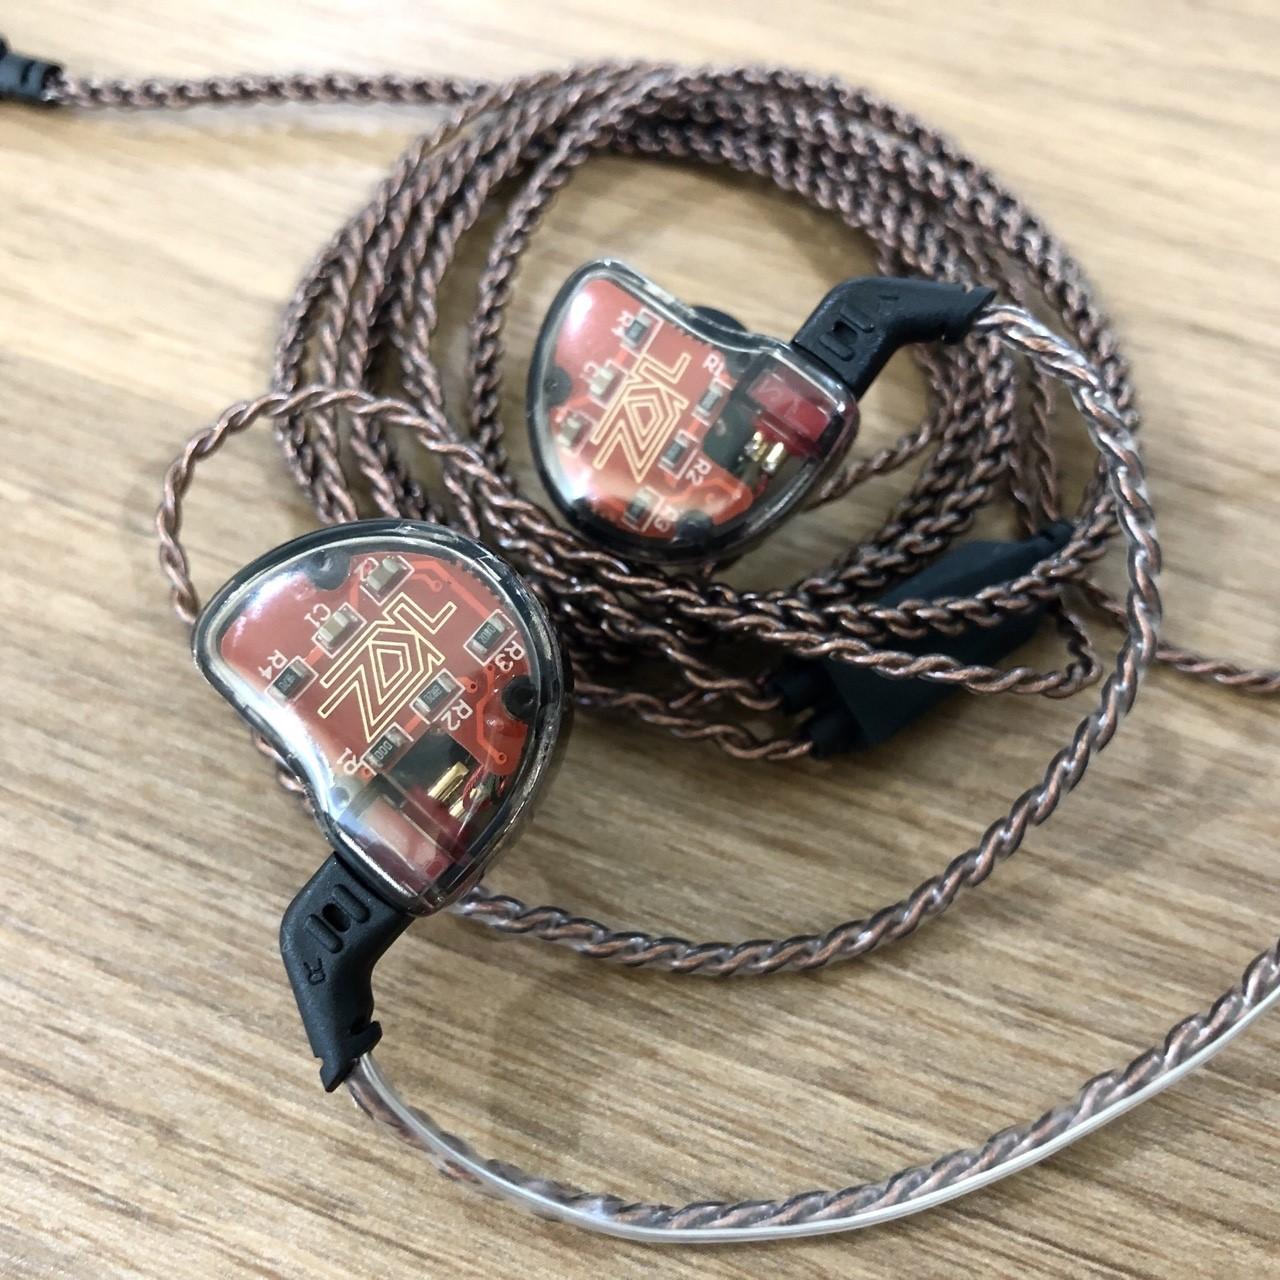 KZ รุ่น ZS10 สีดำ (มีไมค์ ) หูฟัง Hybrid 5 ไดร์เวอร์ ถอดเปลี่ยนสายได้ ประกัน 6 เดือน รูปทรง in ear monitor (IEM) เสียงดี มิติครบ